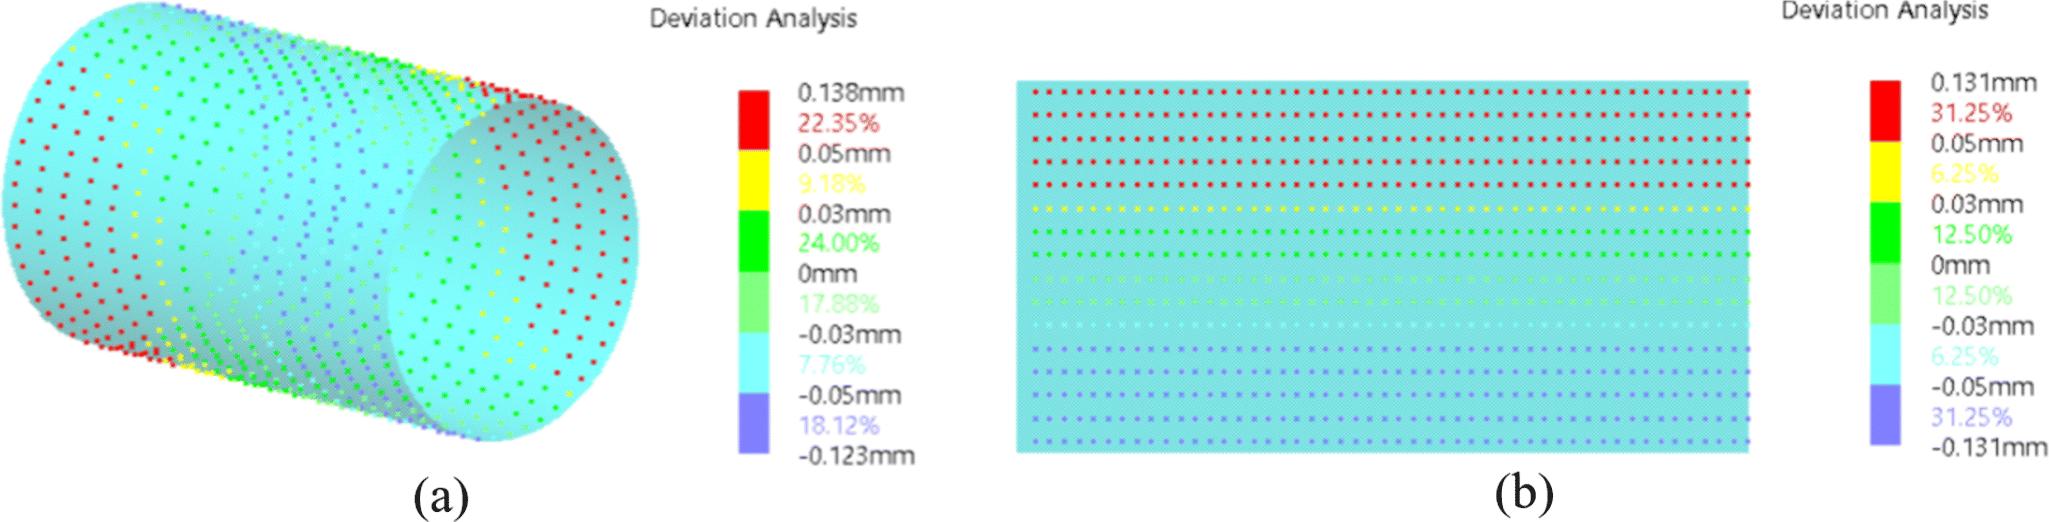 A primitive-based 3D reconstruction method for